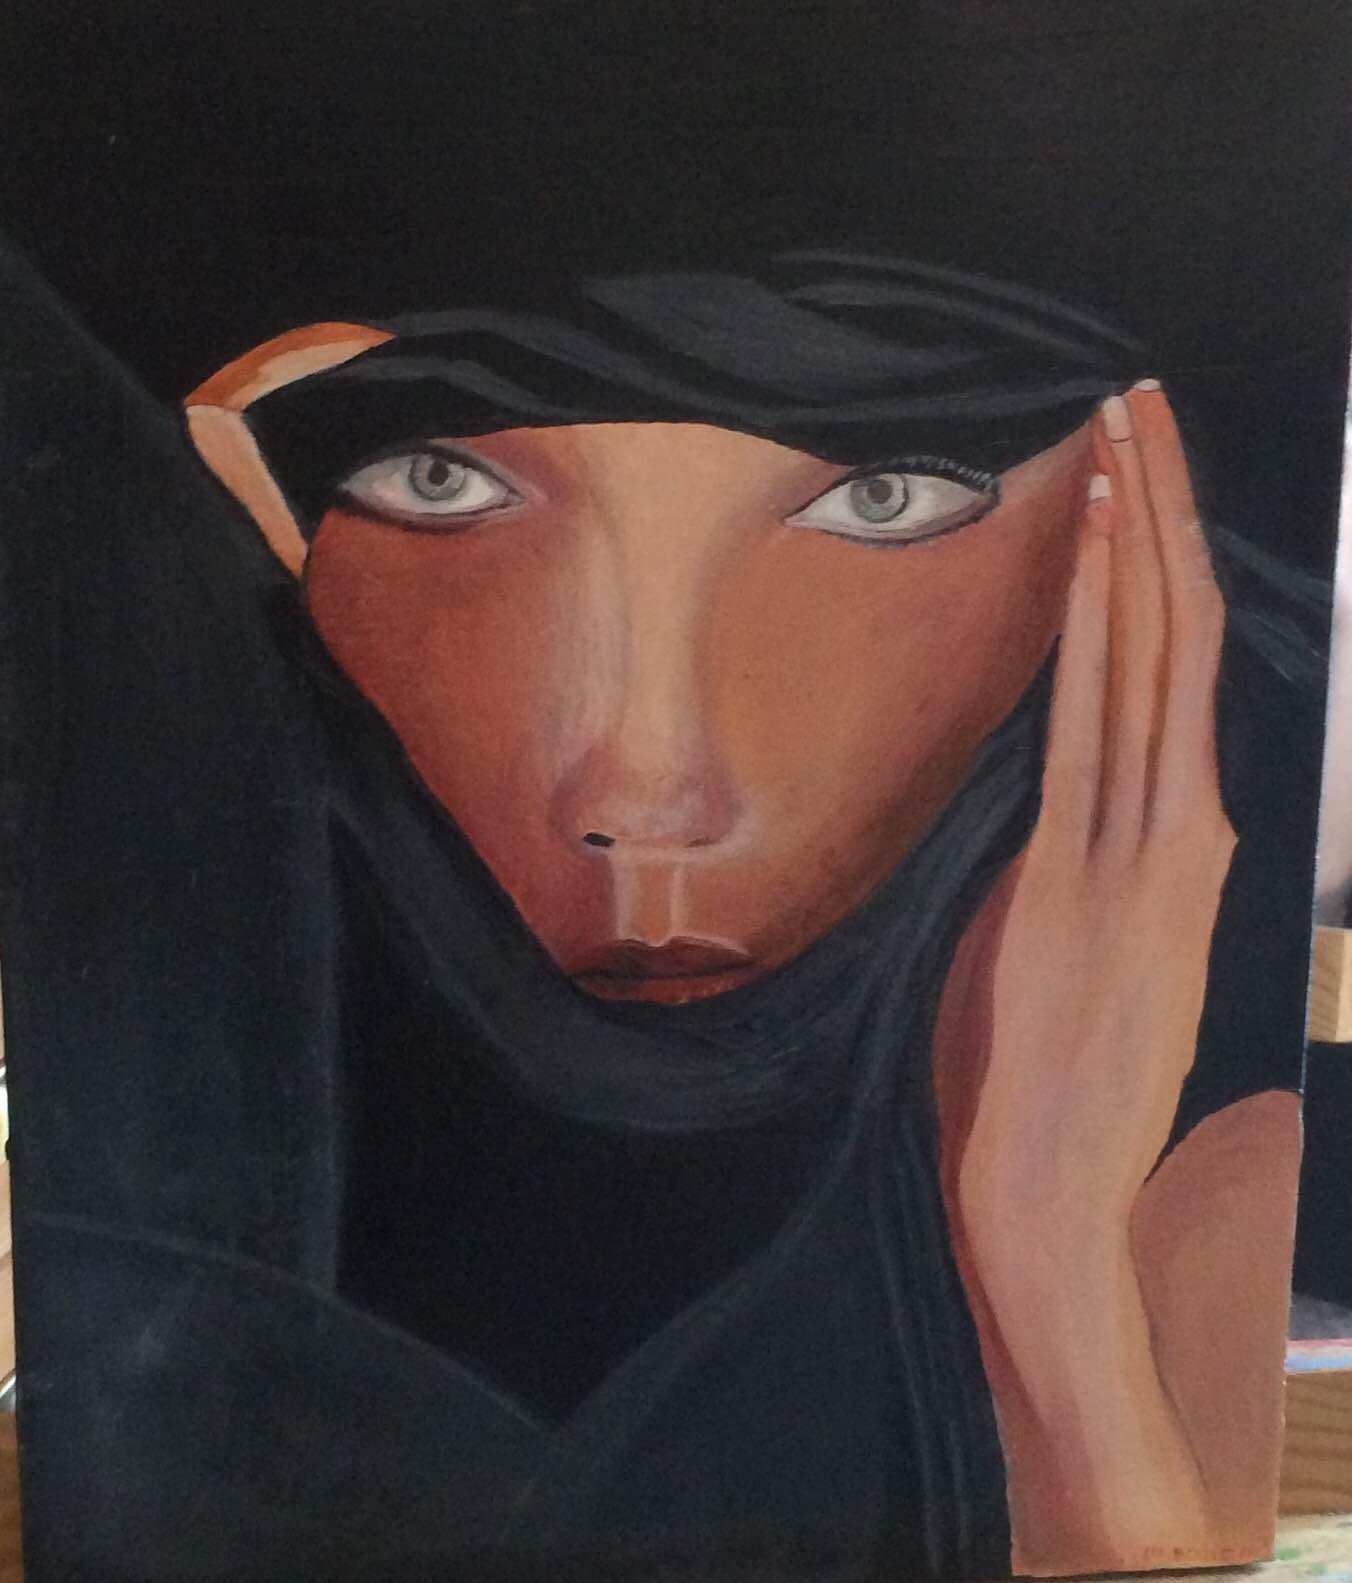 Visage femme voile noir